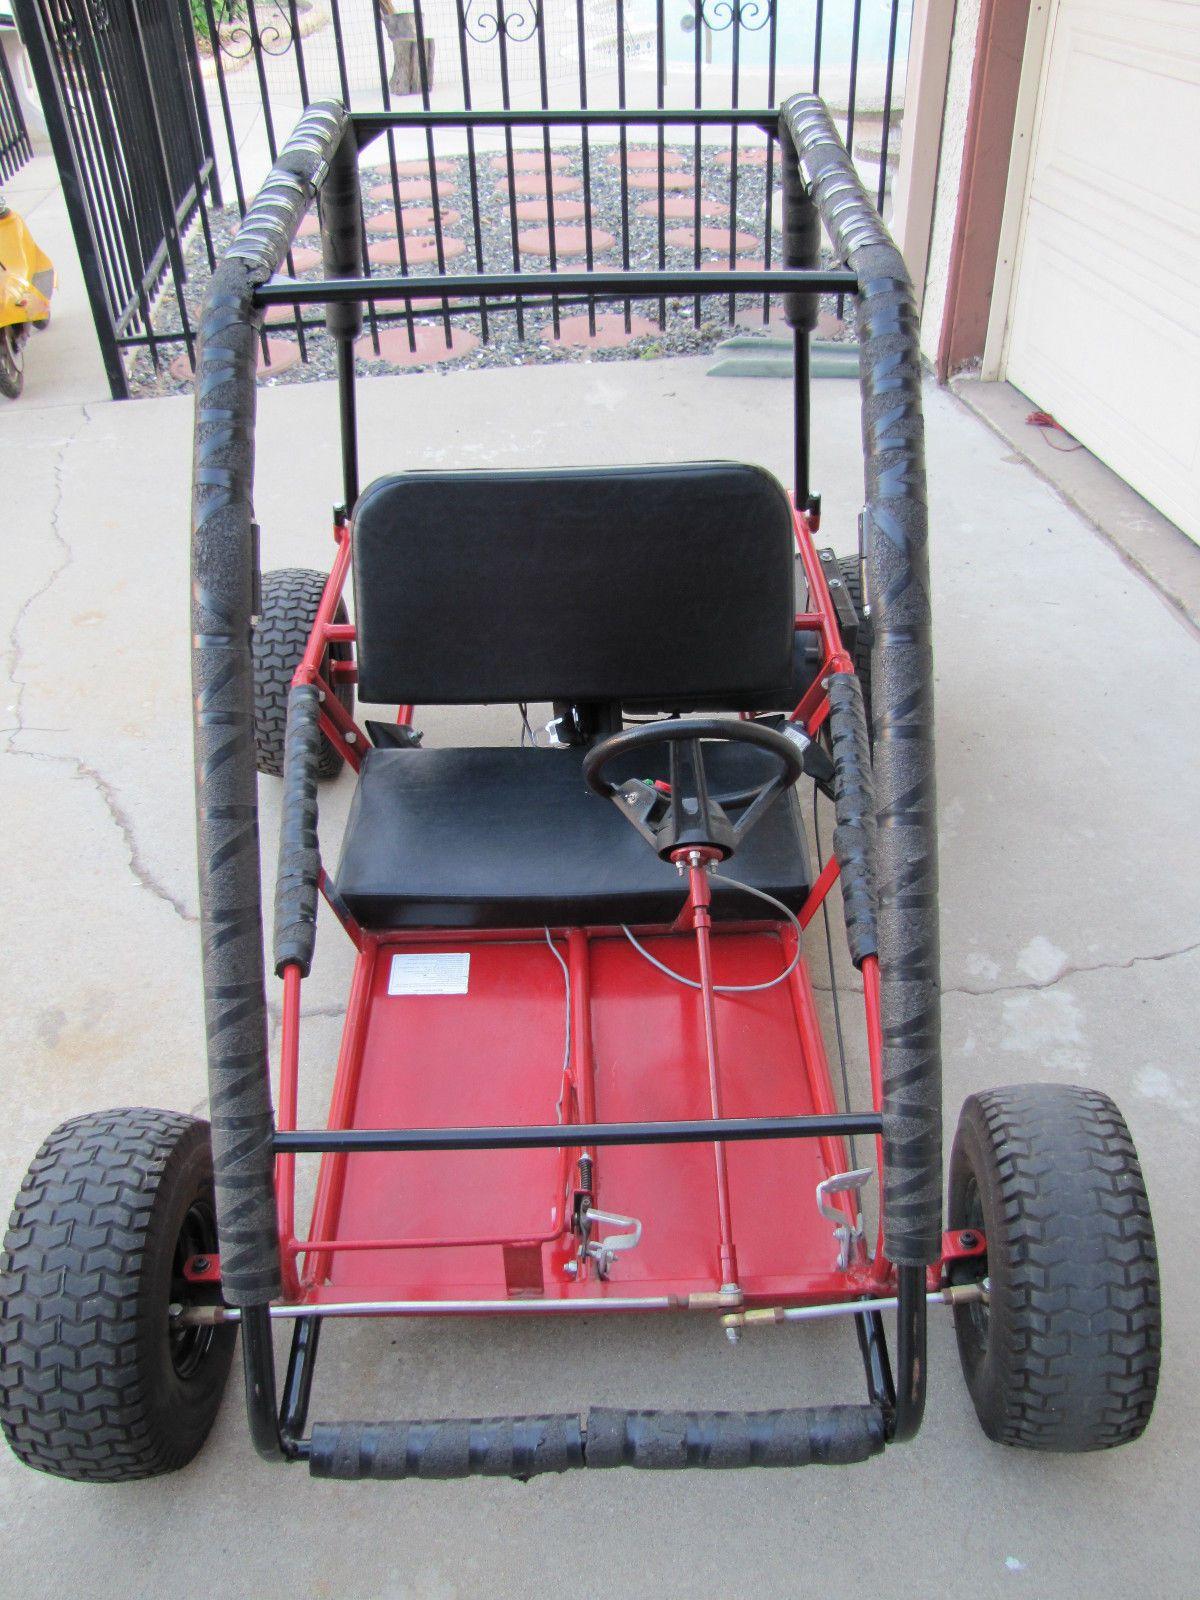 Working Kango Electric Go Kart Go Cart | eBay | ATV | Pinterest